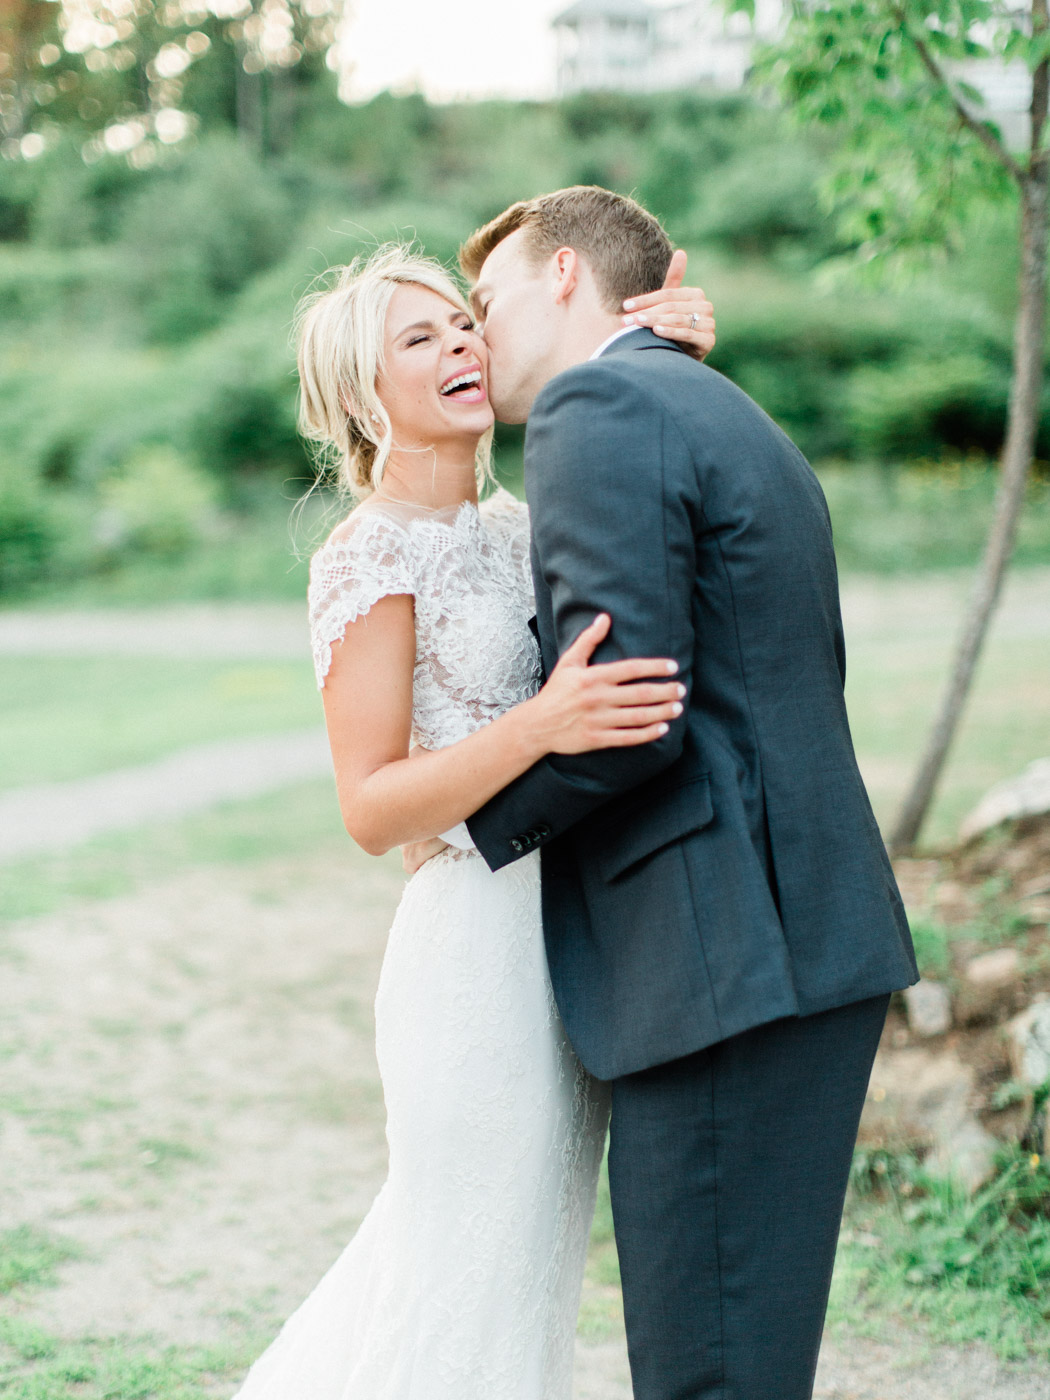 Toronto-Muskoka-wedding-photographer-summery-fun-documentary-the-marriott-rosseau123.jpg